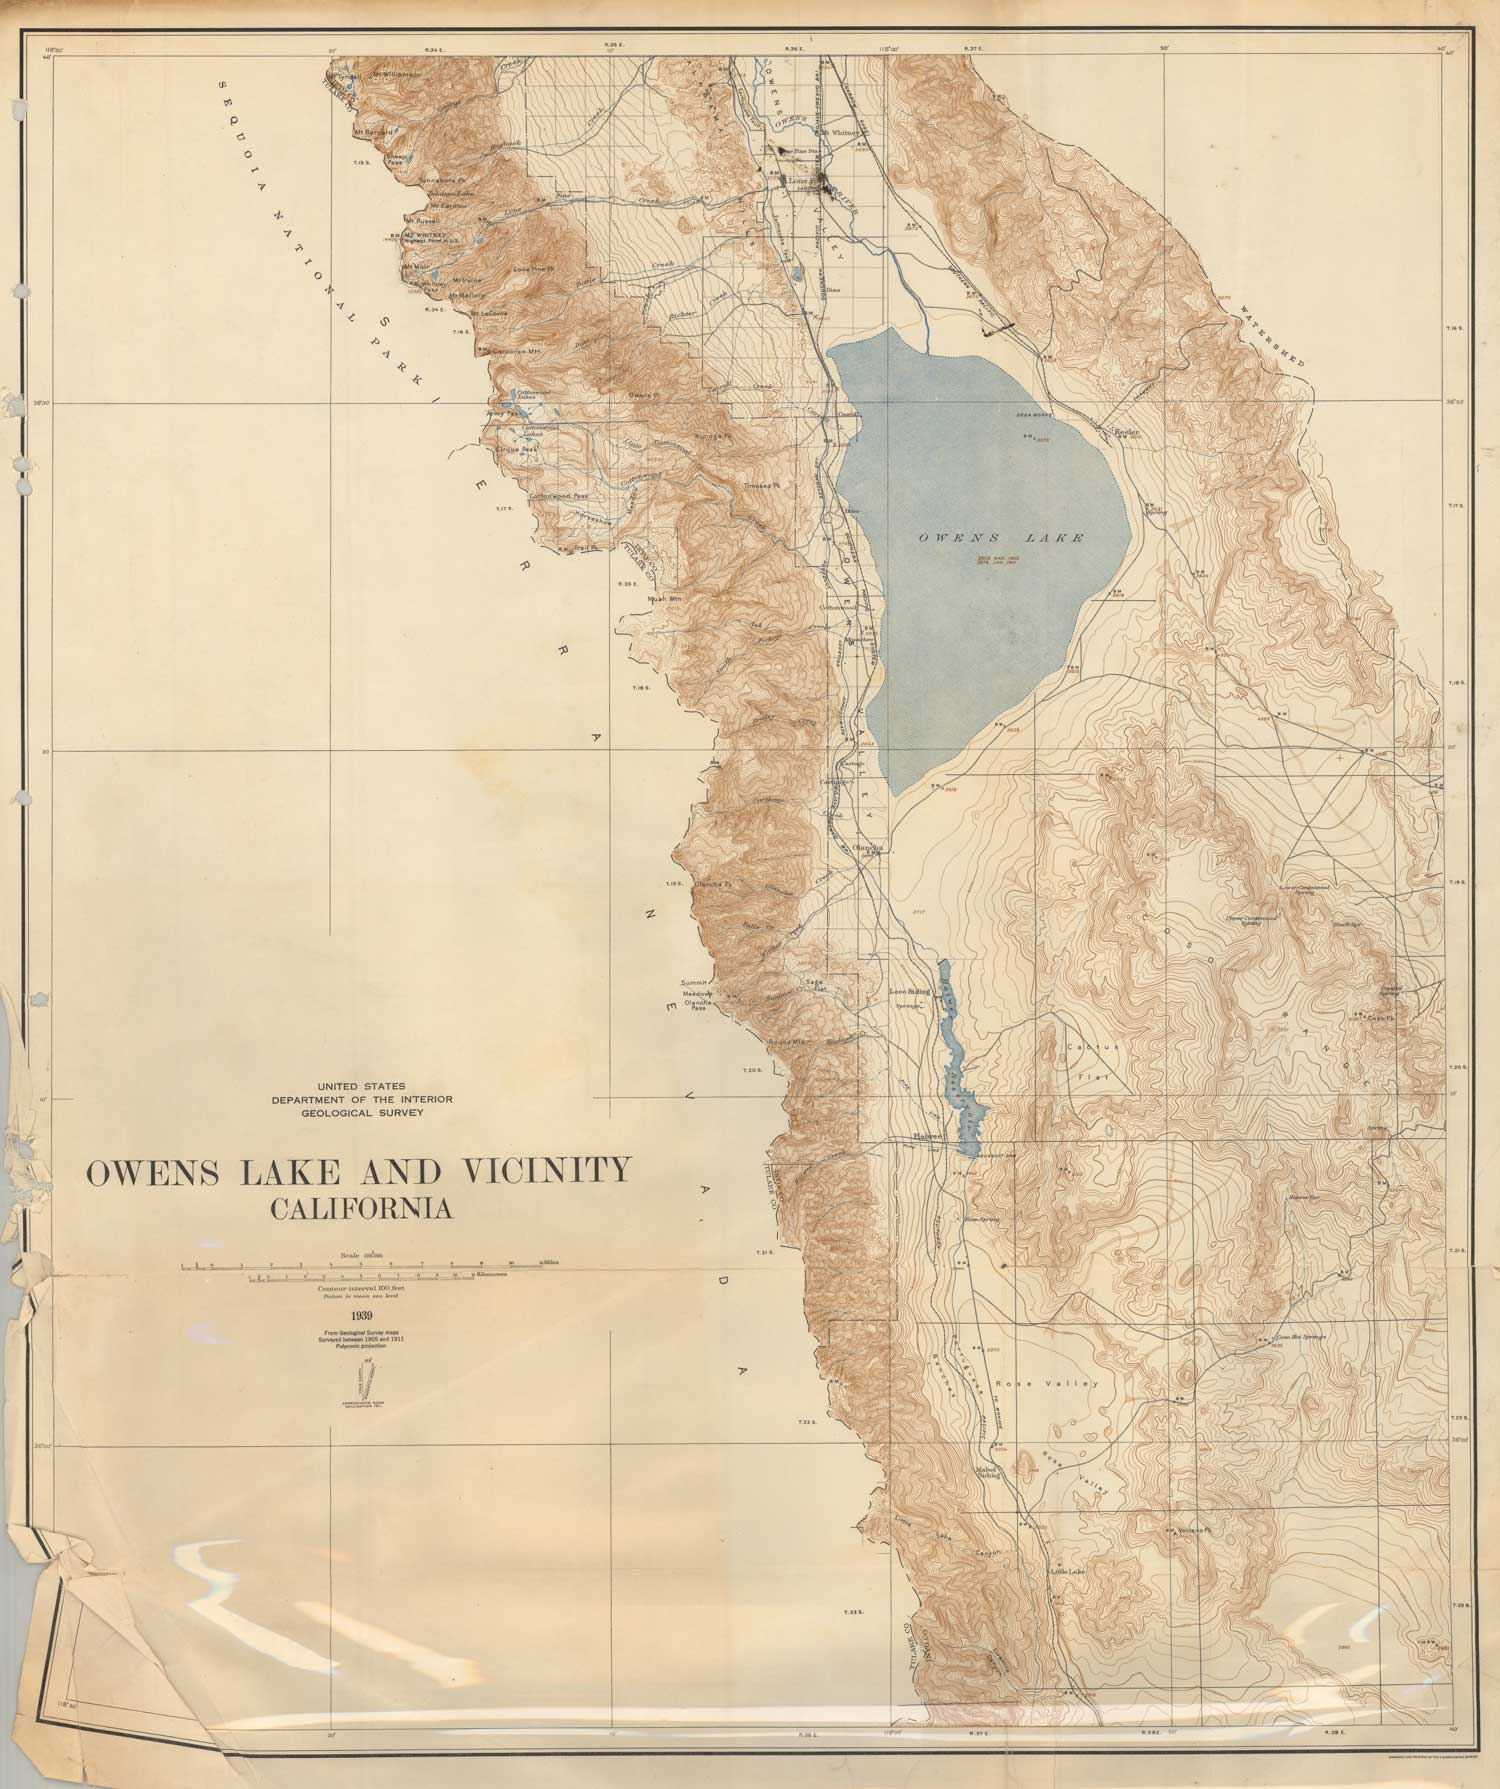 Citydig Here S What Owens Lake Looked Like Before Los Angeles Drank